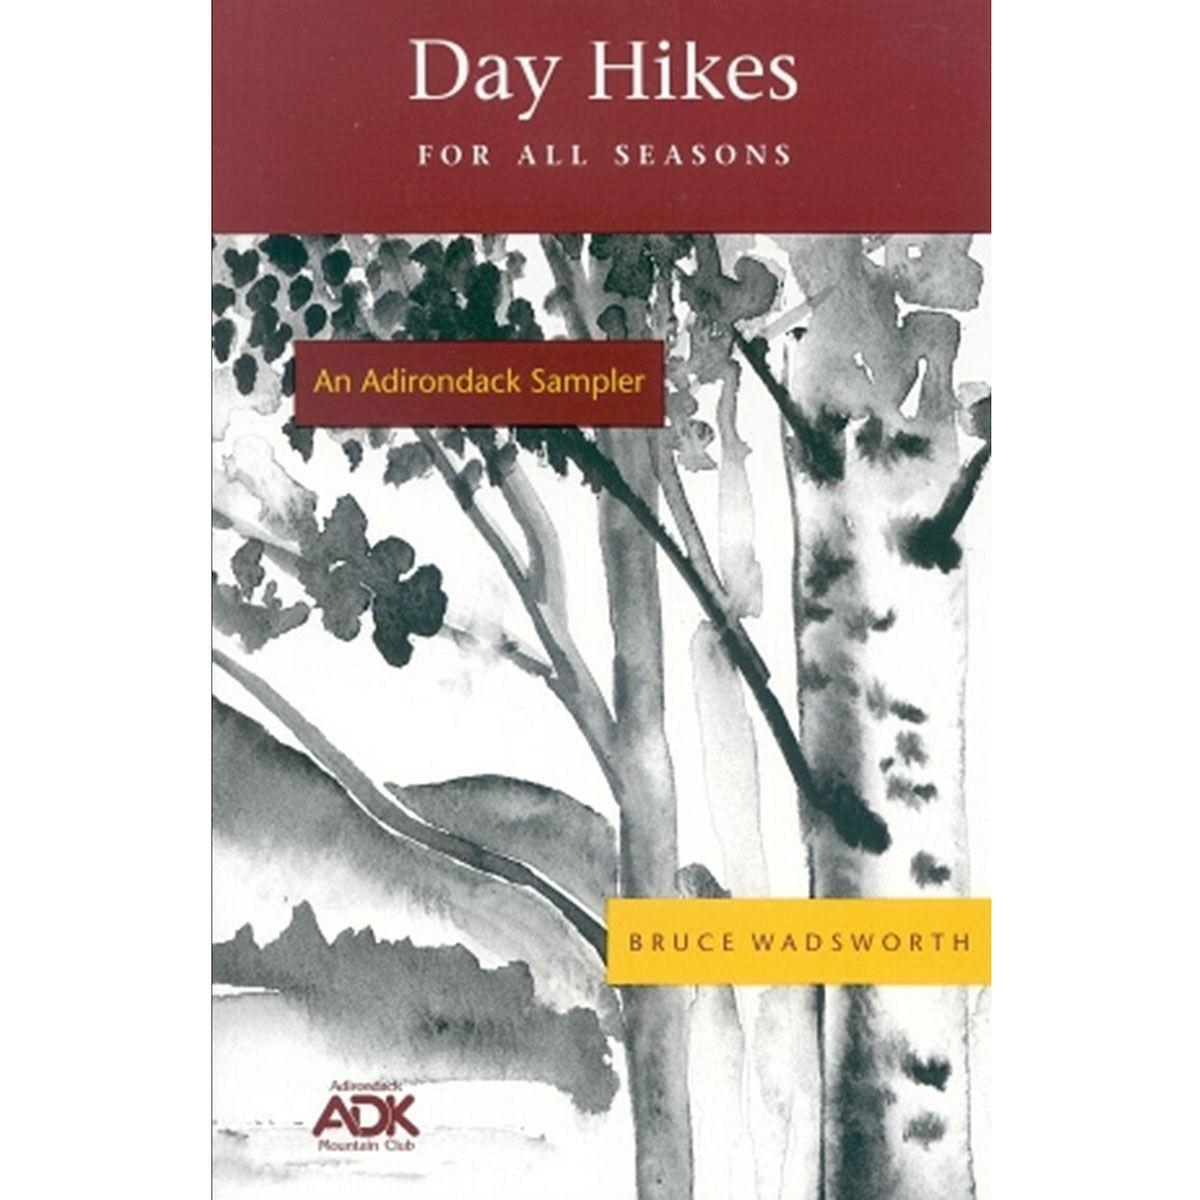 Adirondack Mountain Club Day Hikes for All Seasons - An Adirondack Sampler